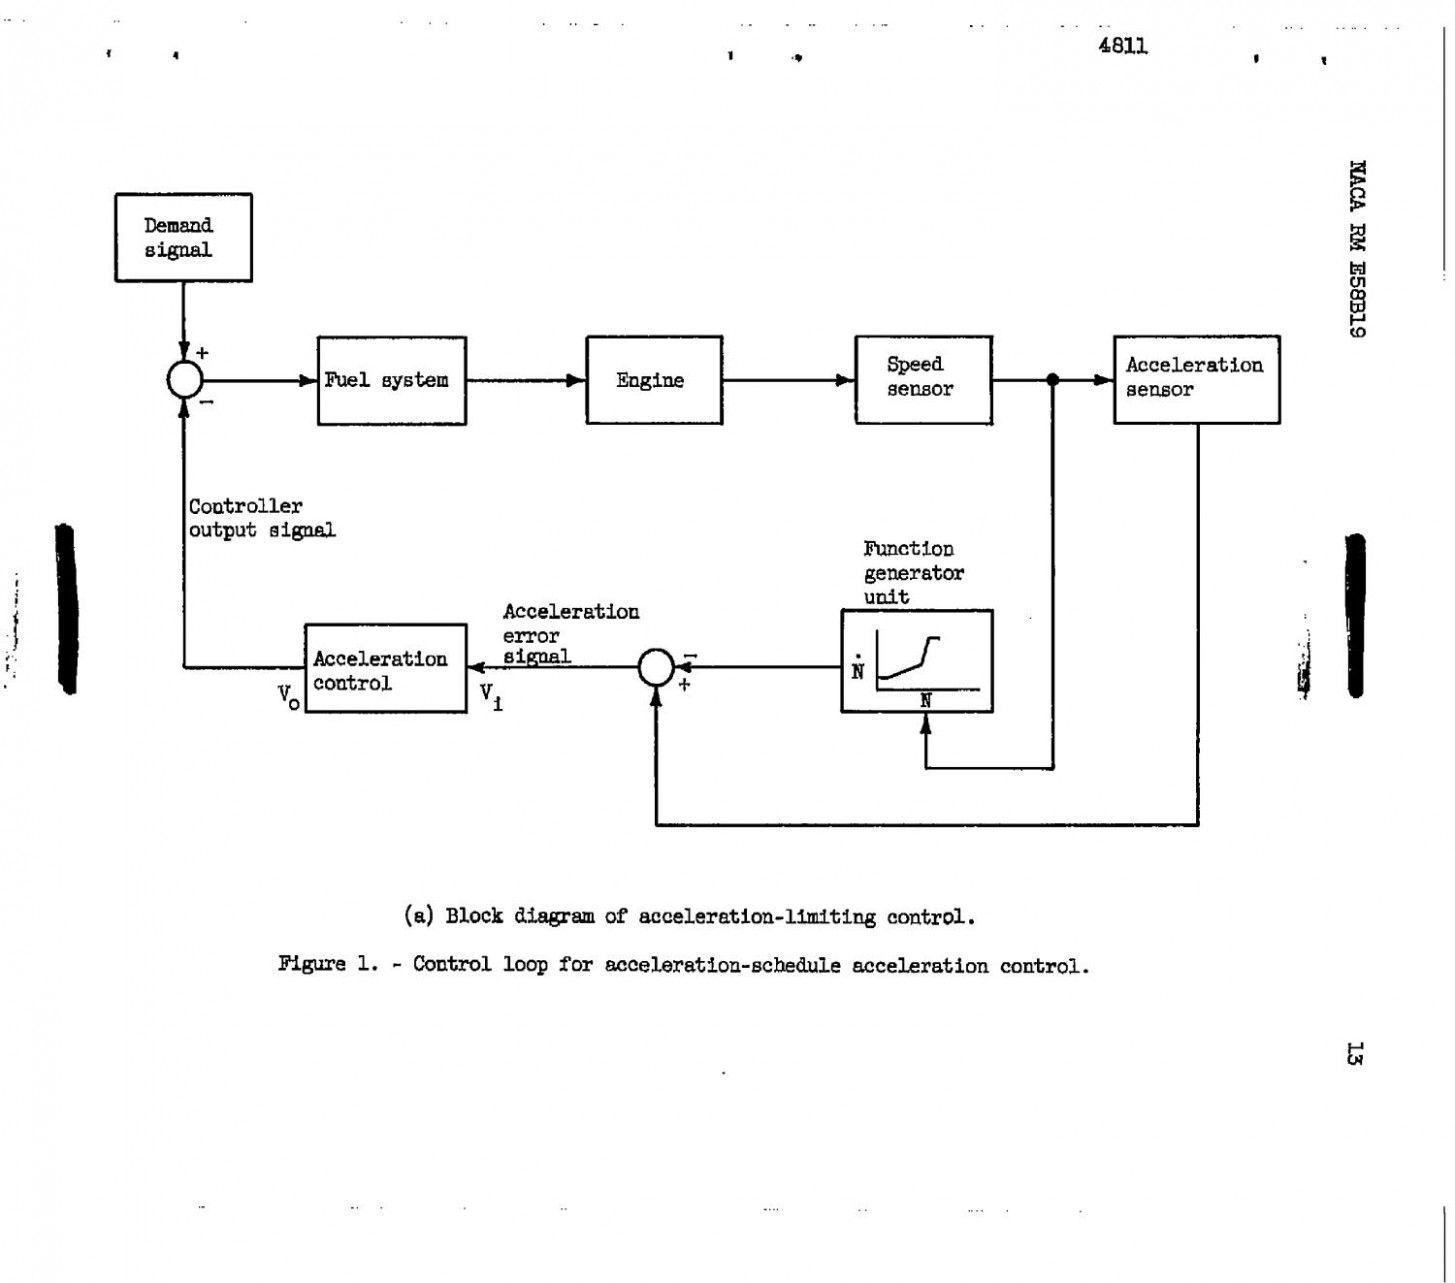 Turbojet Engine Block Diagram Di 2020